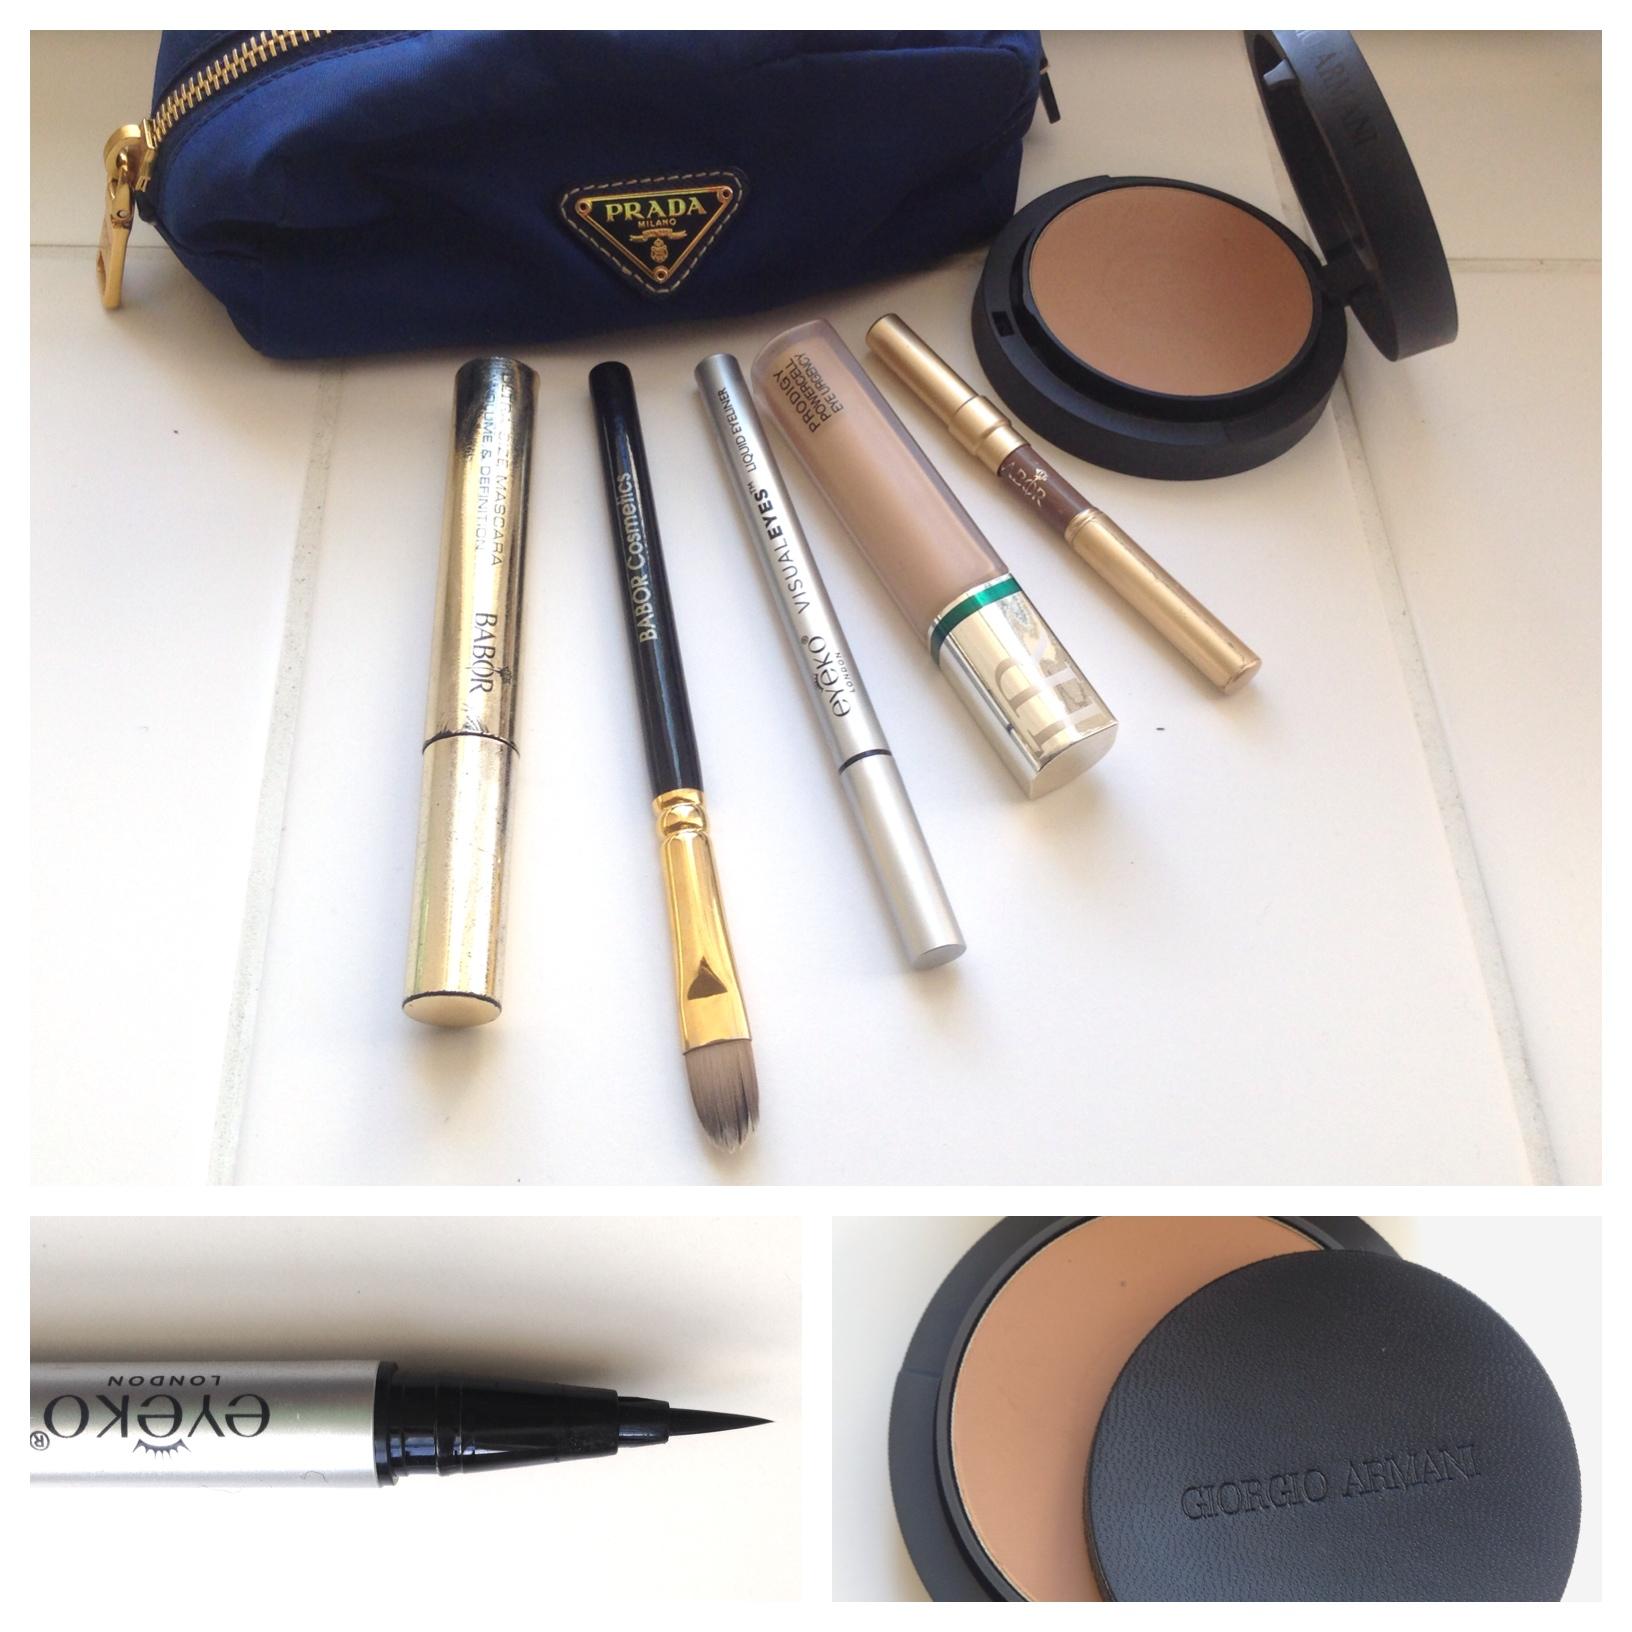 Prada Kosmetikbeutel Brauenstift Babor Mascara Helena Rubinstein Concealer Eyeliner Eyeko Compact Powder Armani